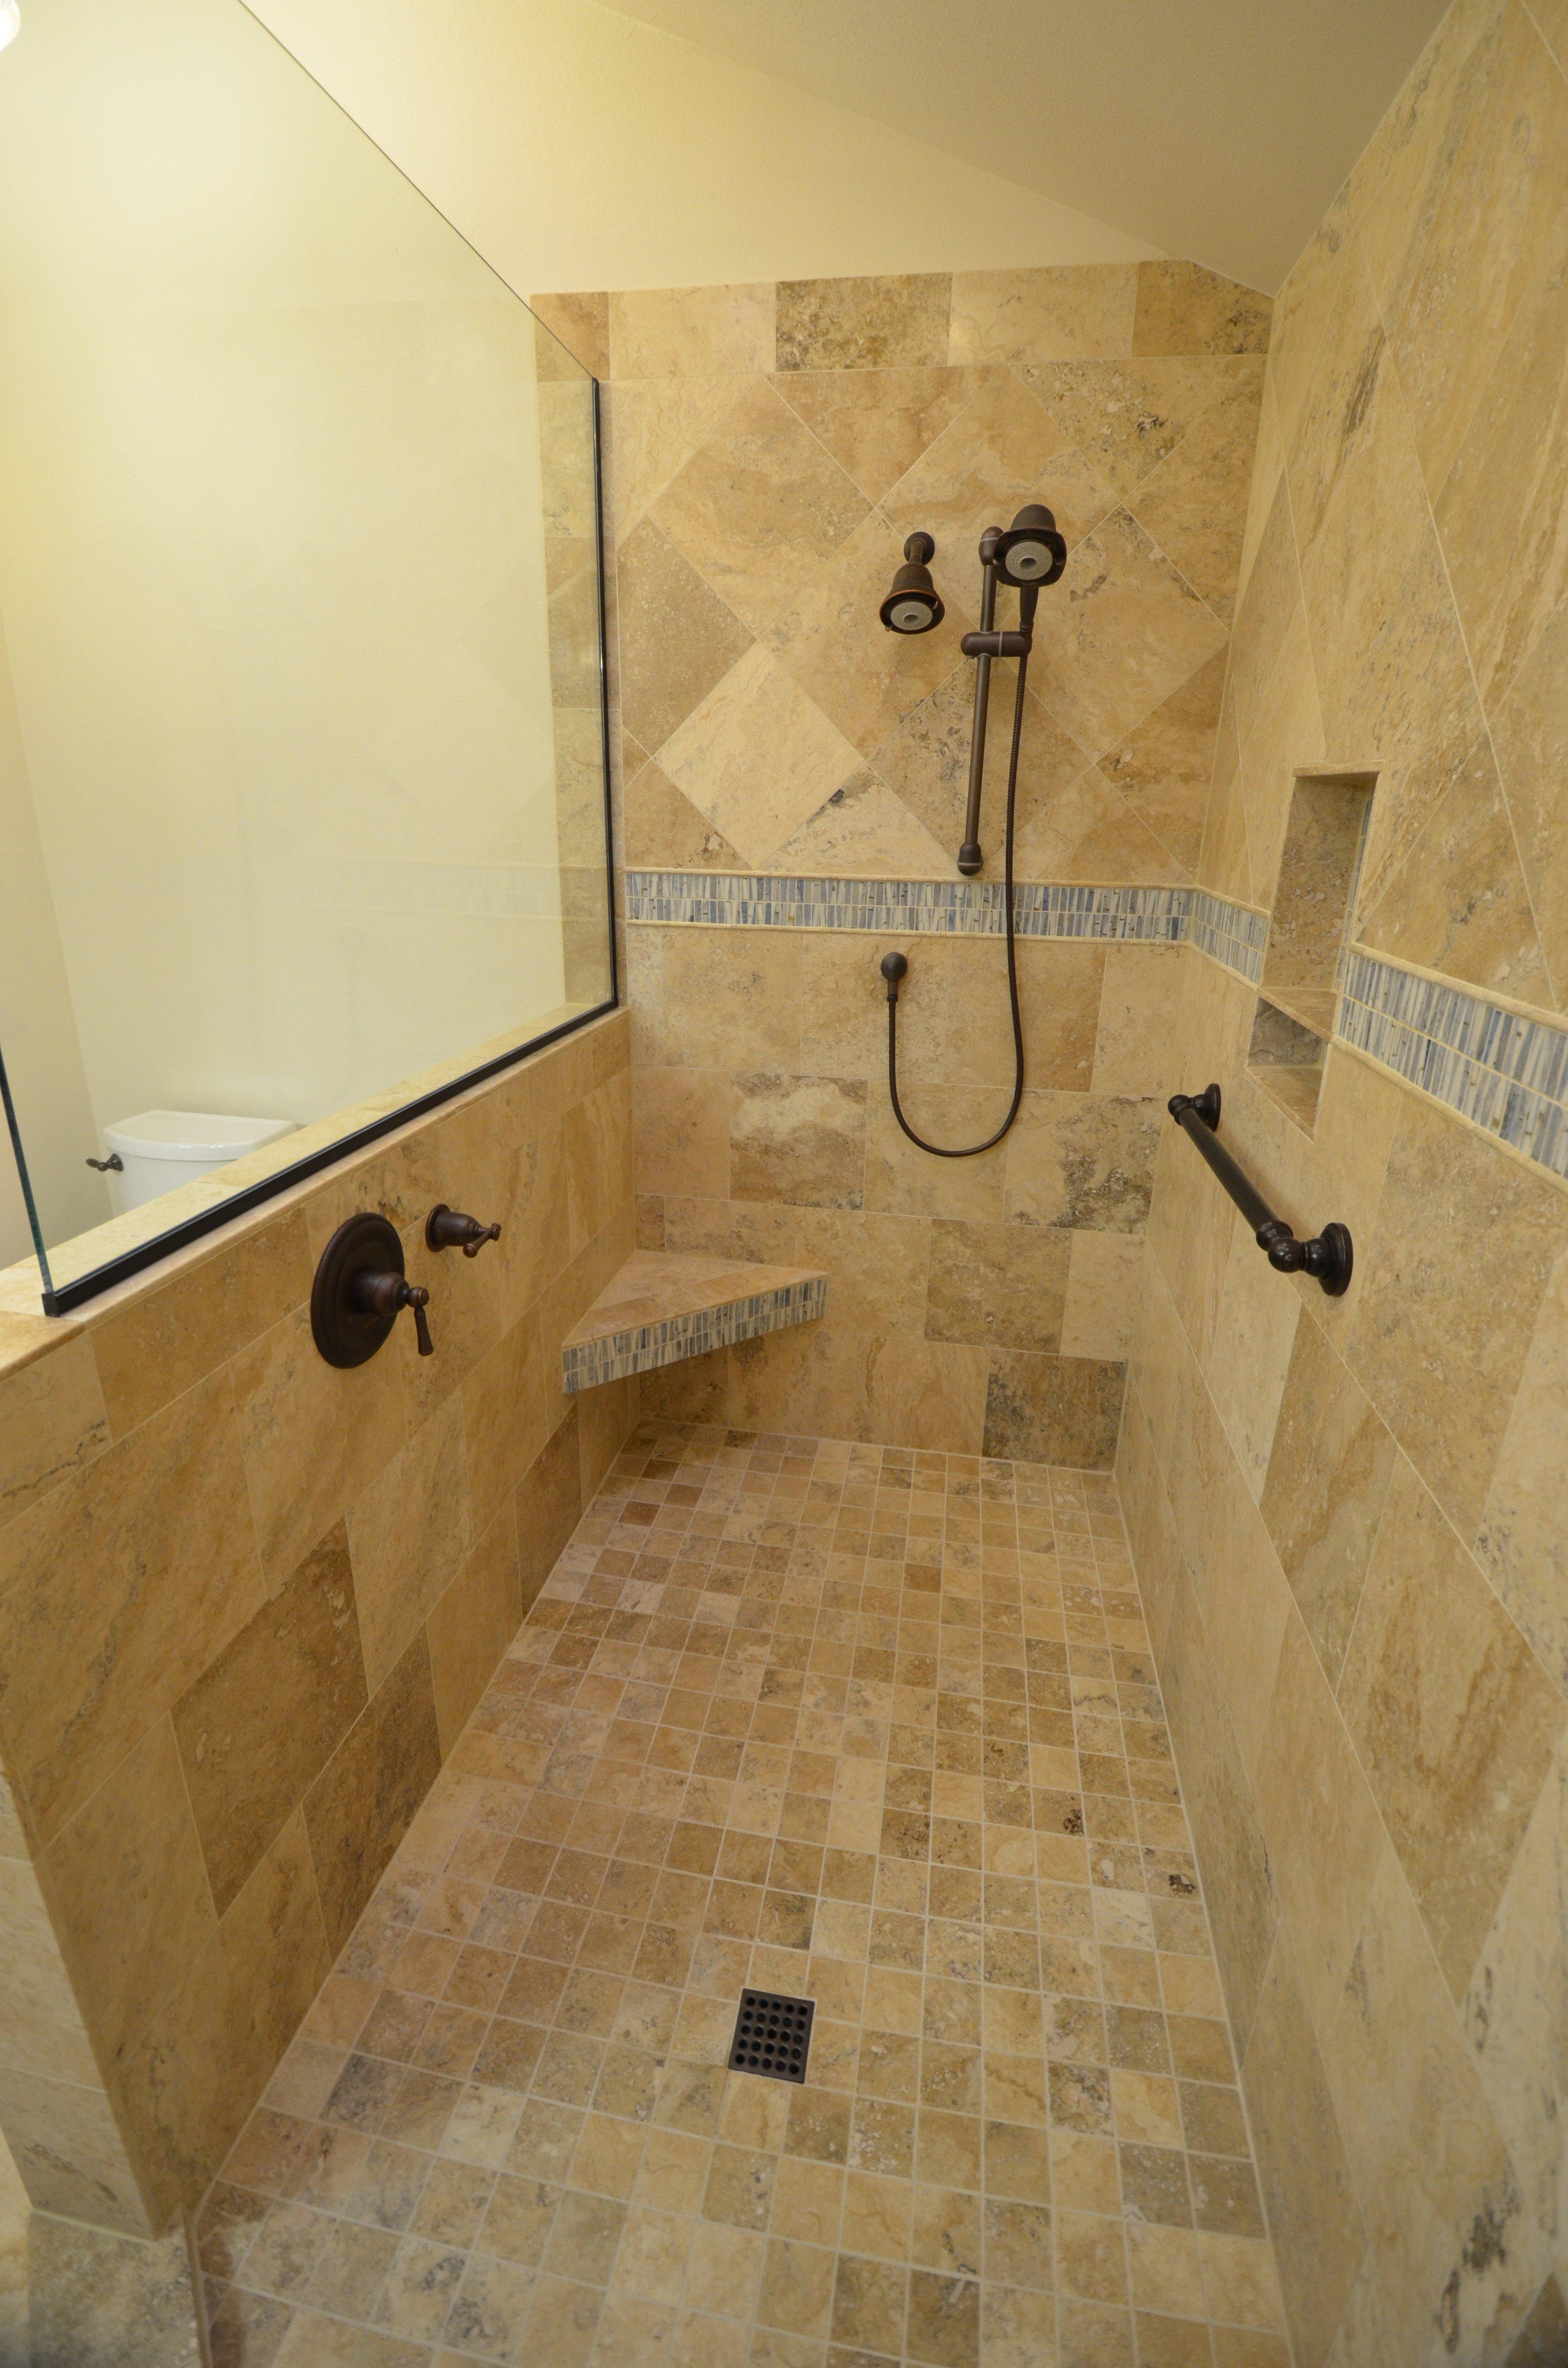 10 Spectacular Doorless Walk In Shower Ideas bathroom showers without doors or curtains walk in shower designs